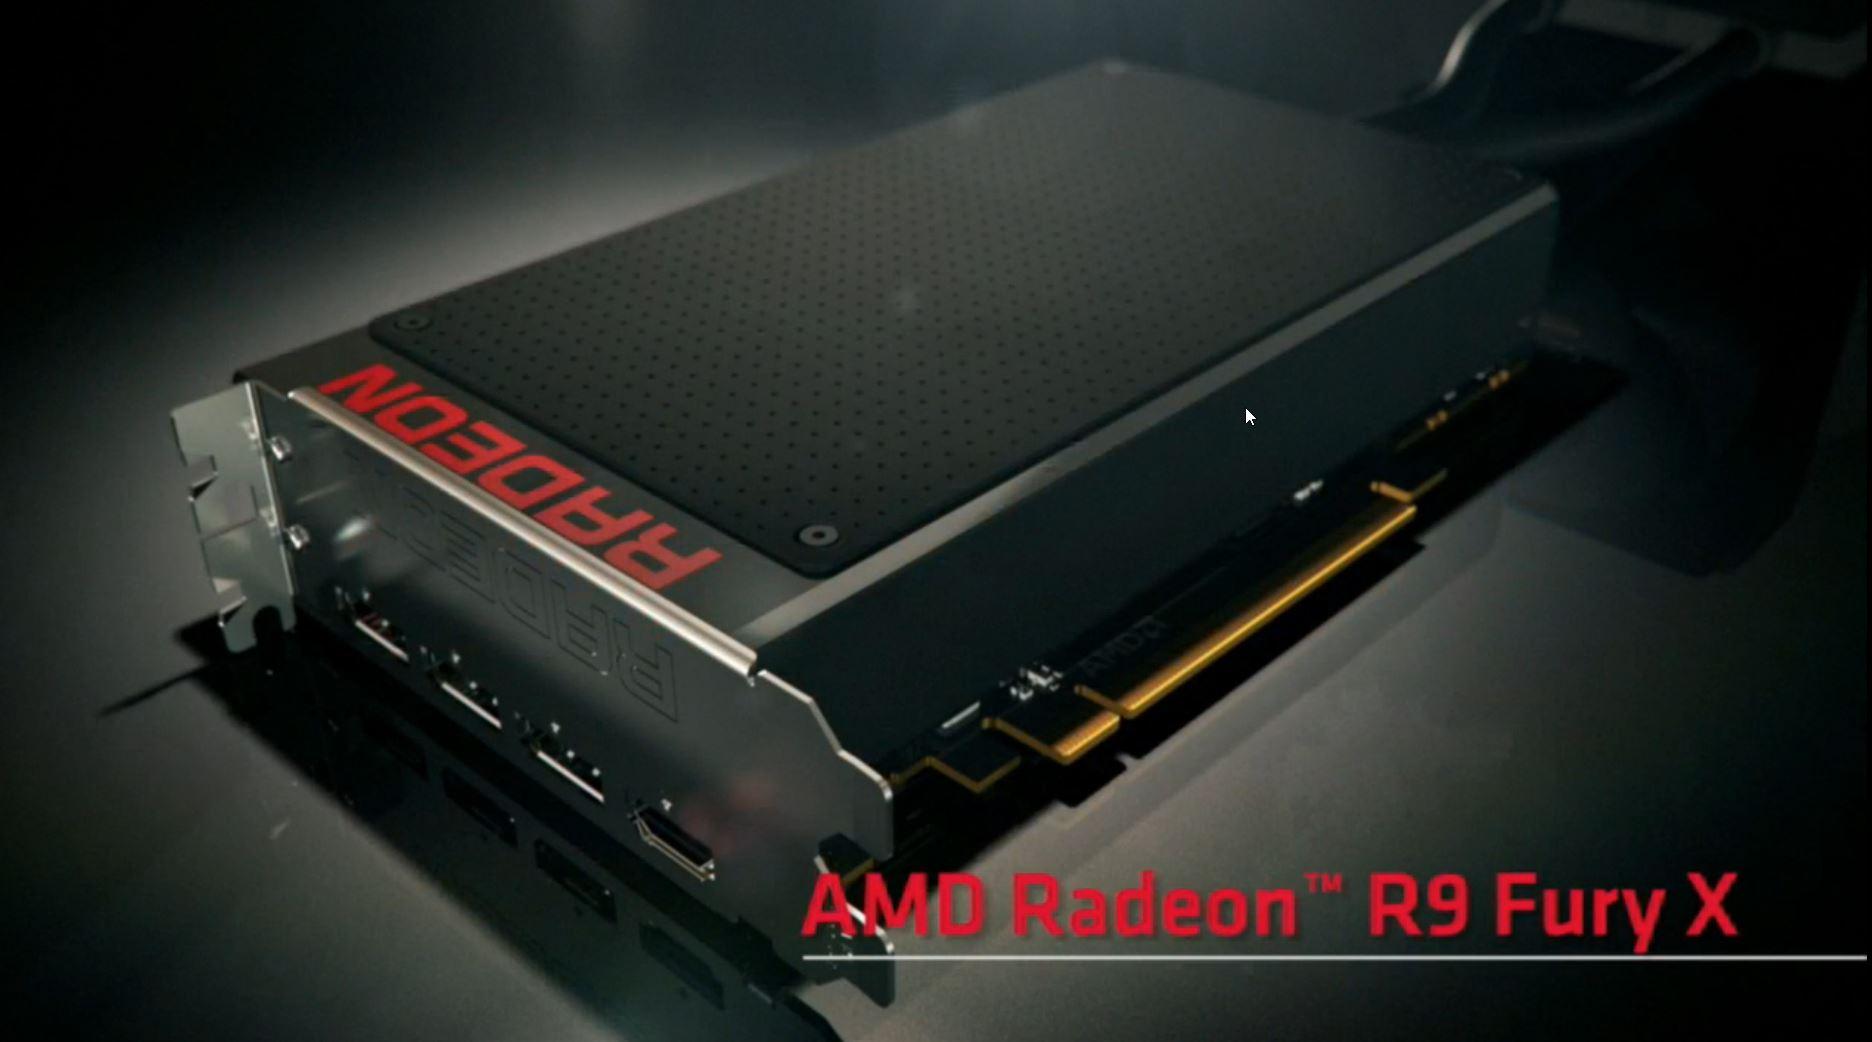 AMD Radeon R9 Fury X, R9 Nano and Fury Unveiled - Fiji GPU Based, HBM Powered, $649 US Priced ...